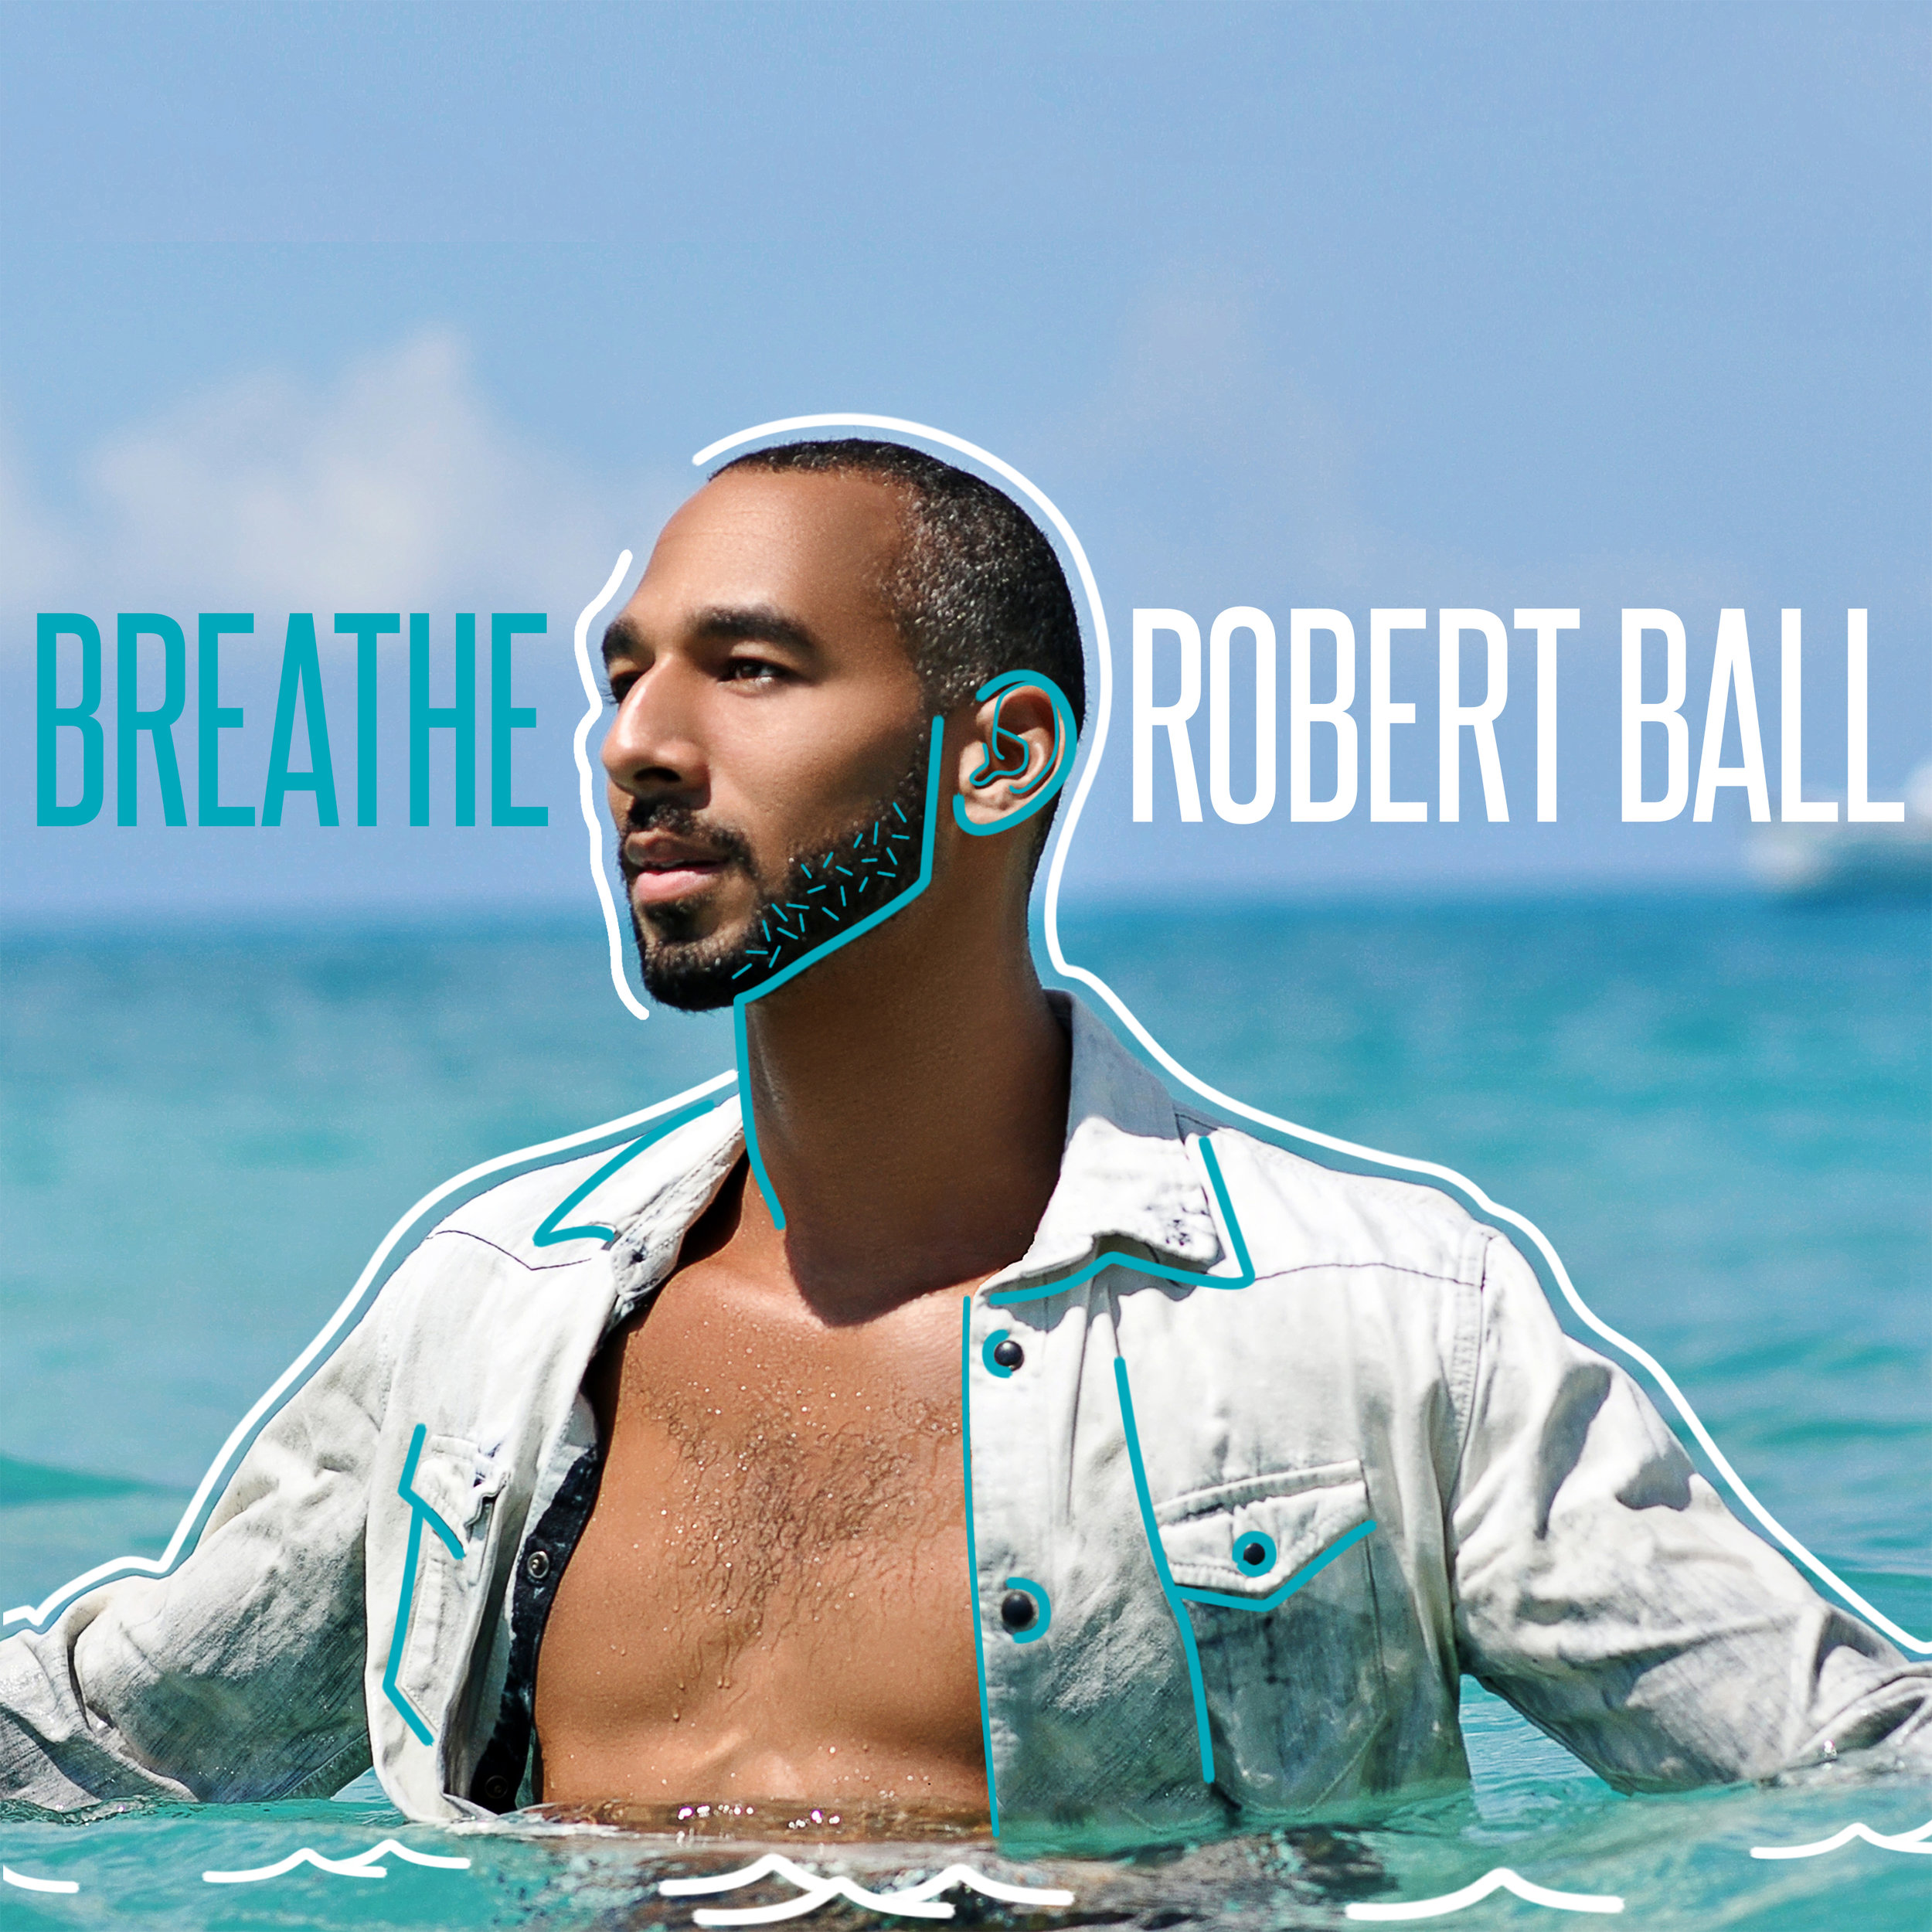 robertball-breathe4-7.jpg